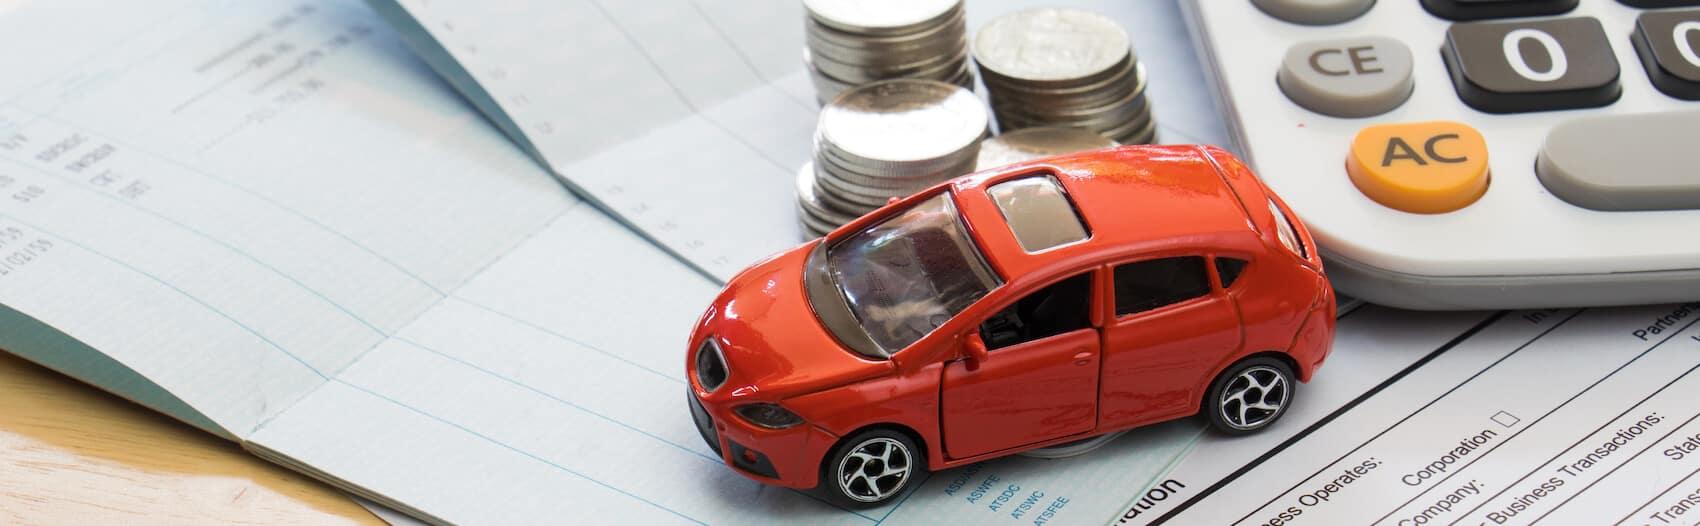 Financing used luxury car near Yonkers, NY